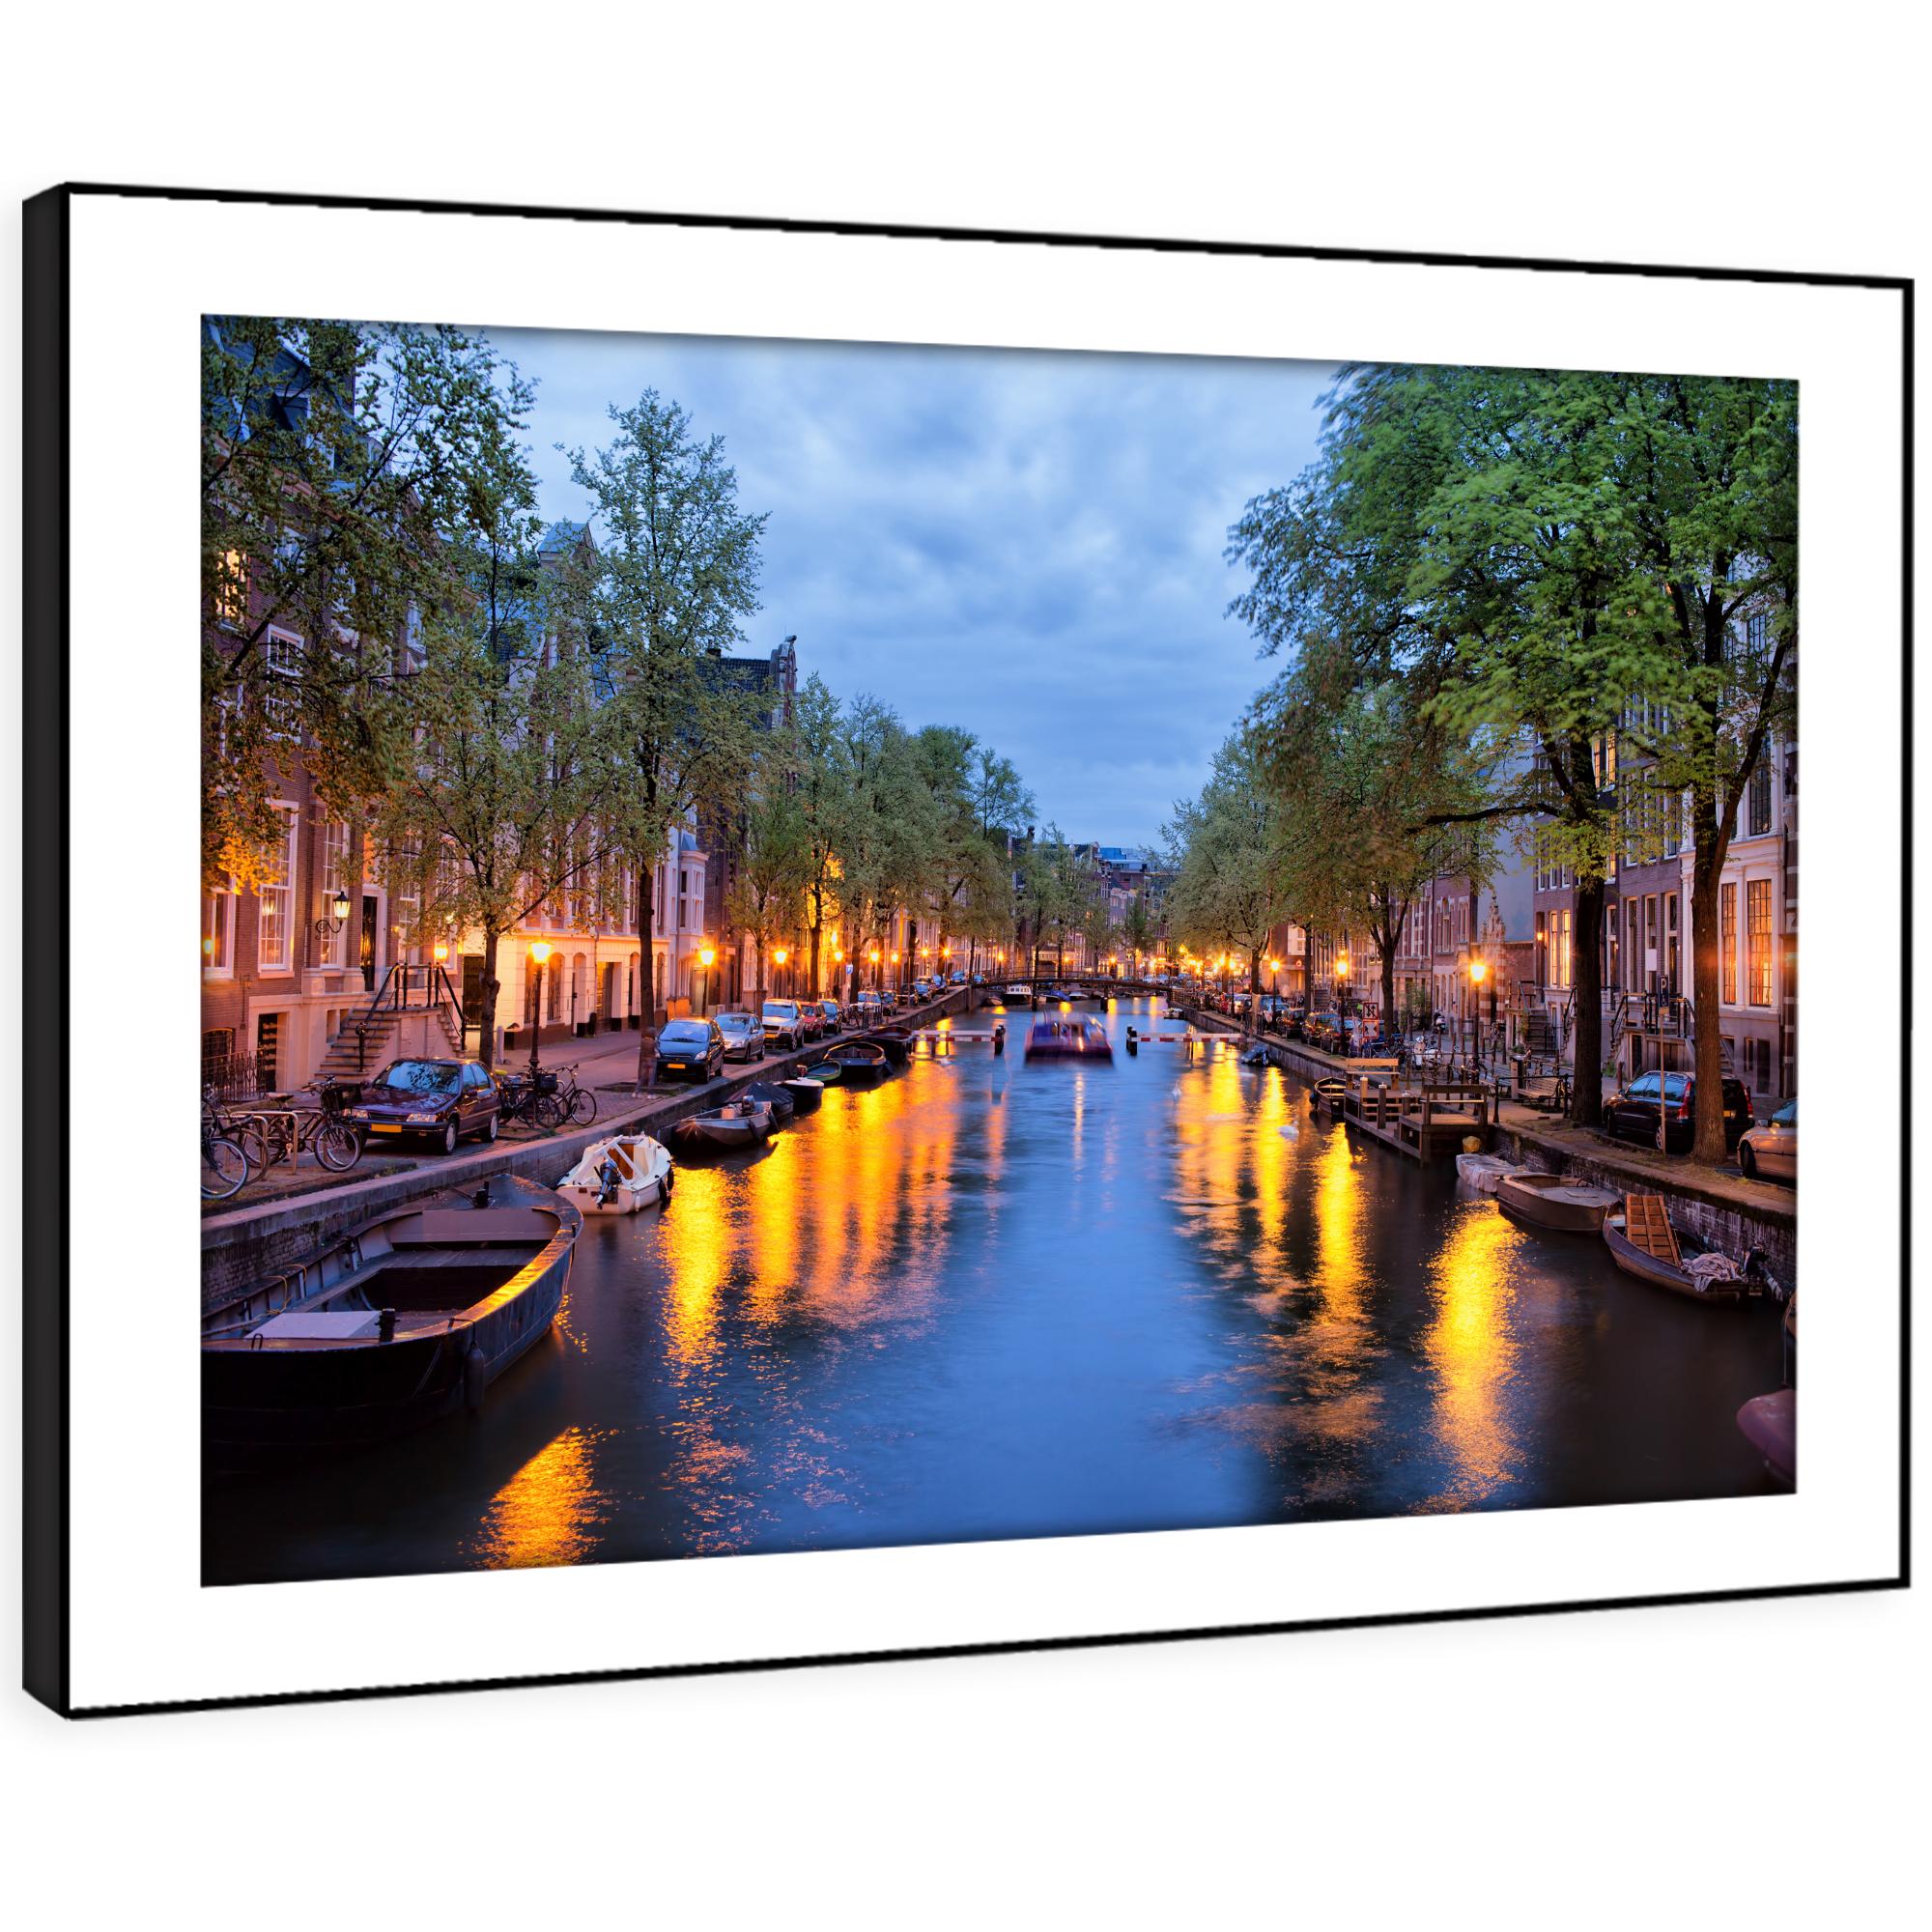 SC375 Amsterdam Blau Orange Night Landscape Framed Wall Art Large Picture Prints